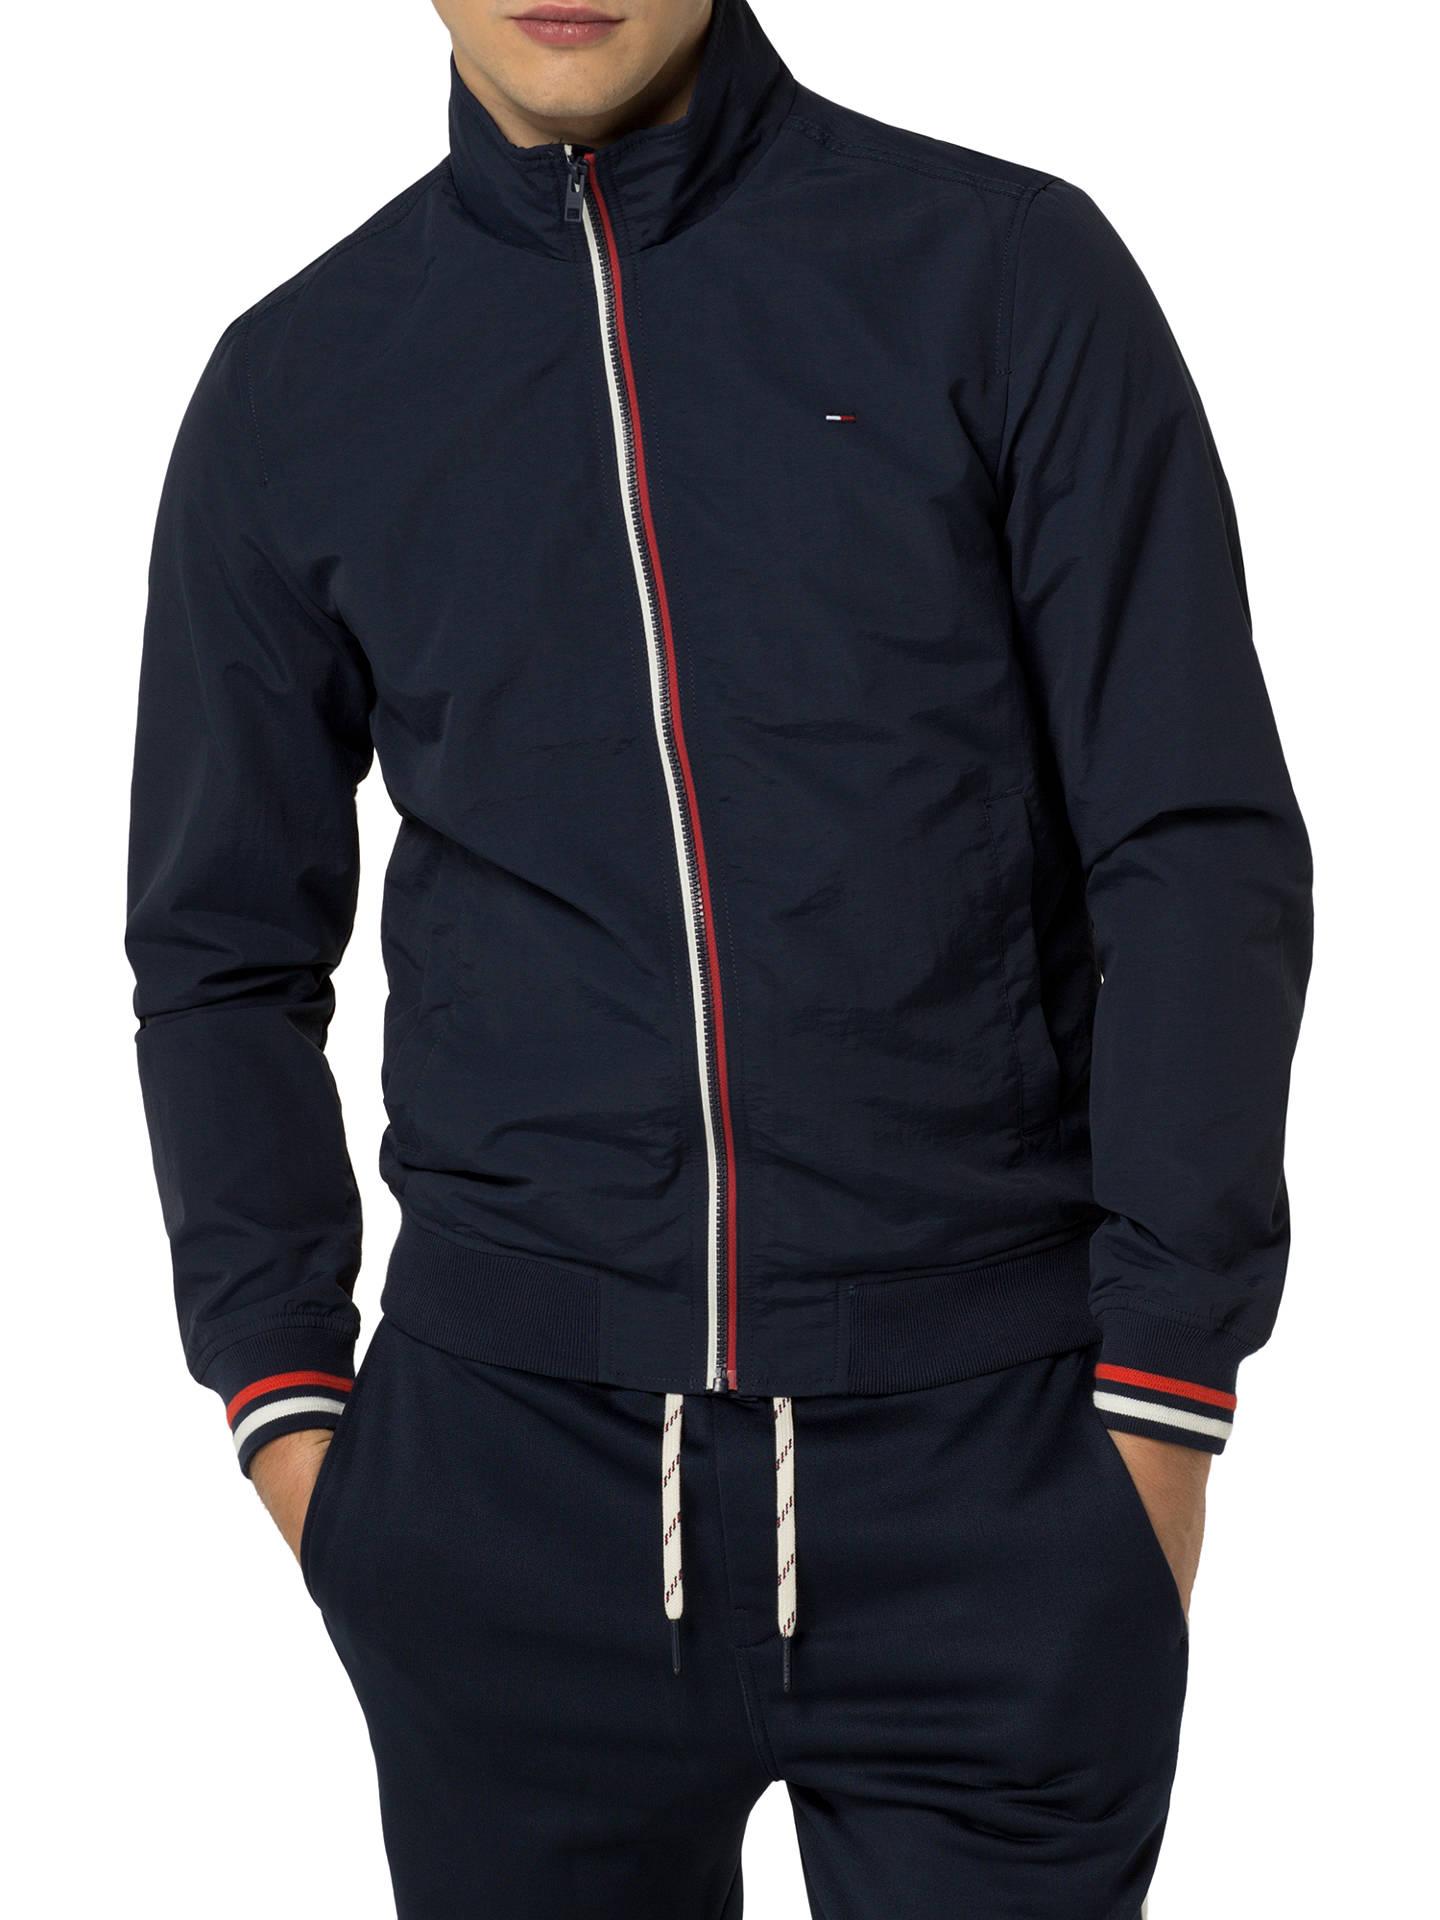 d85e8d98 Buy Tommy Hilfiger Bobby Casual Bomber Jacket, , L Online at johnlewis.com  ...